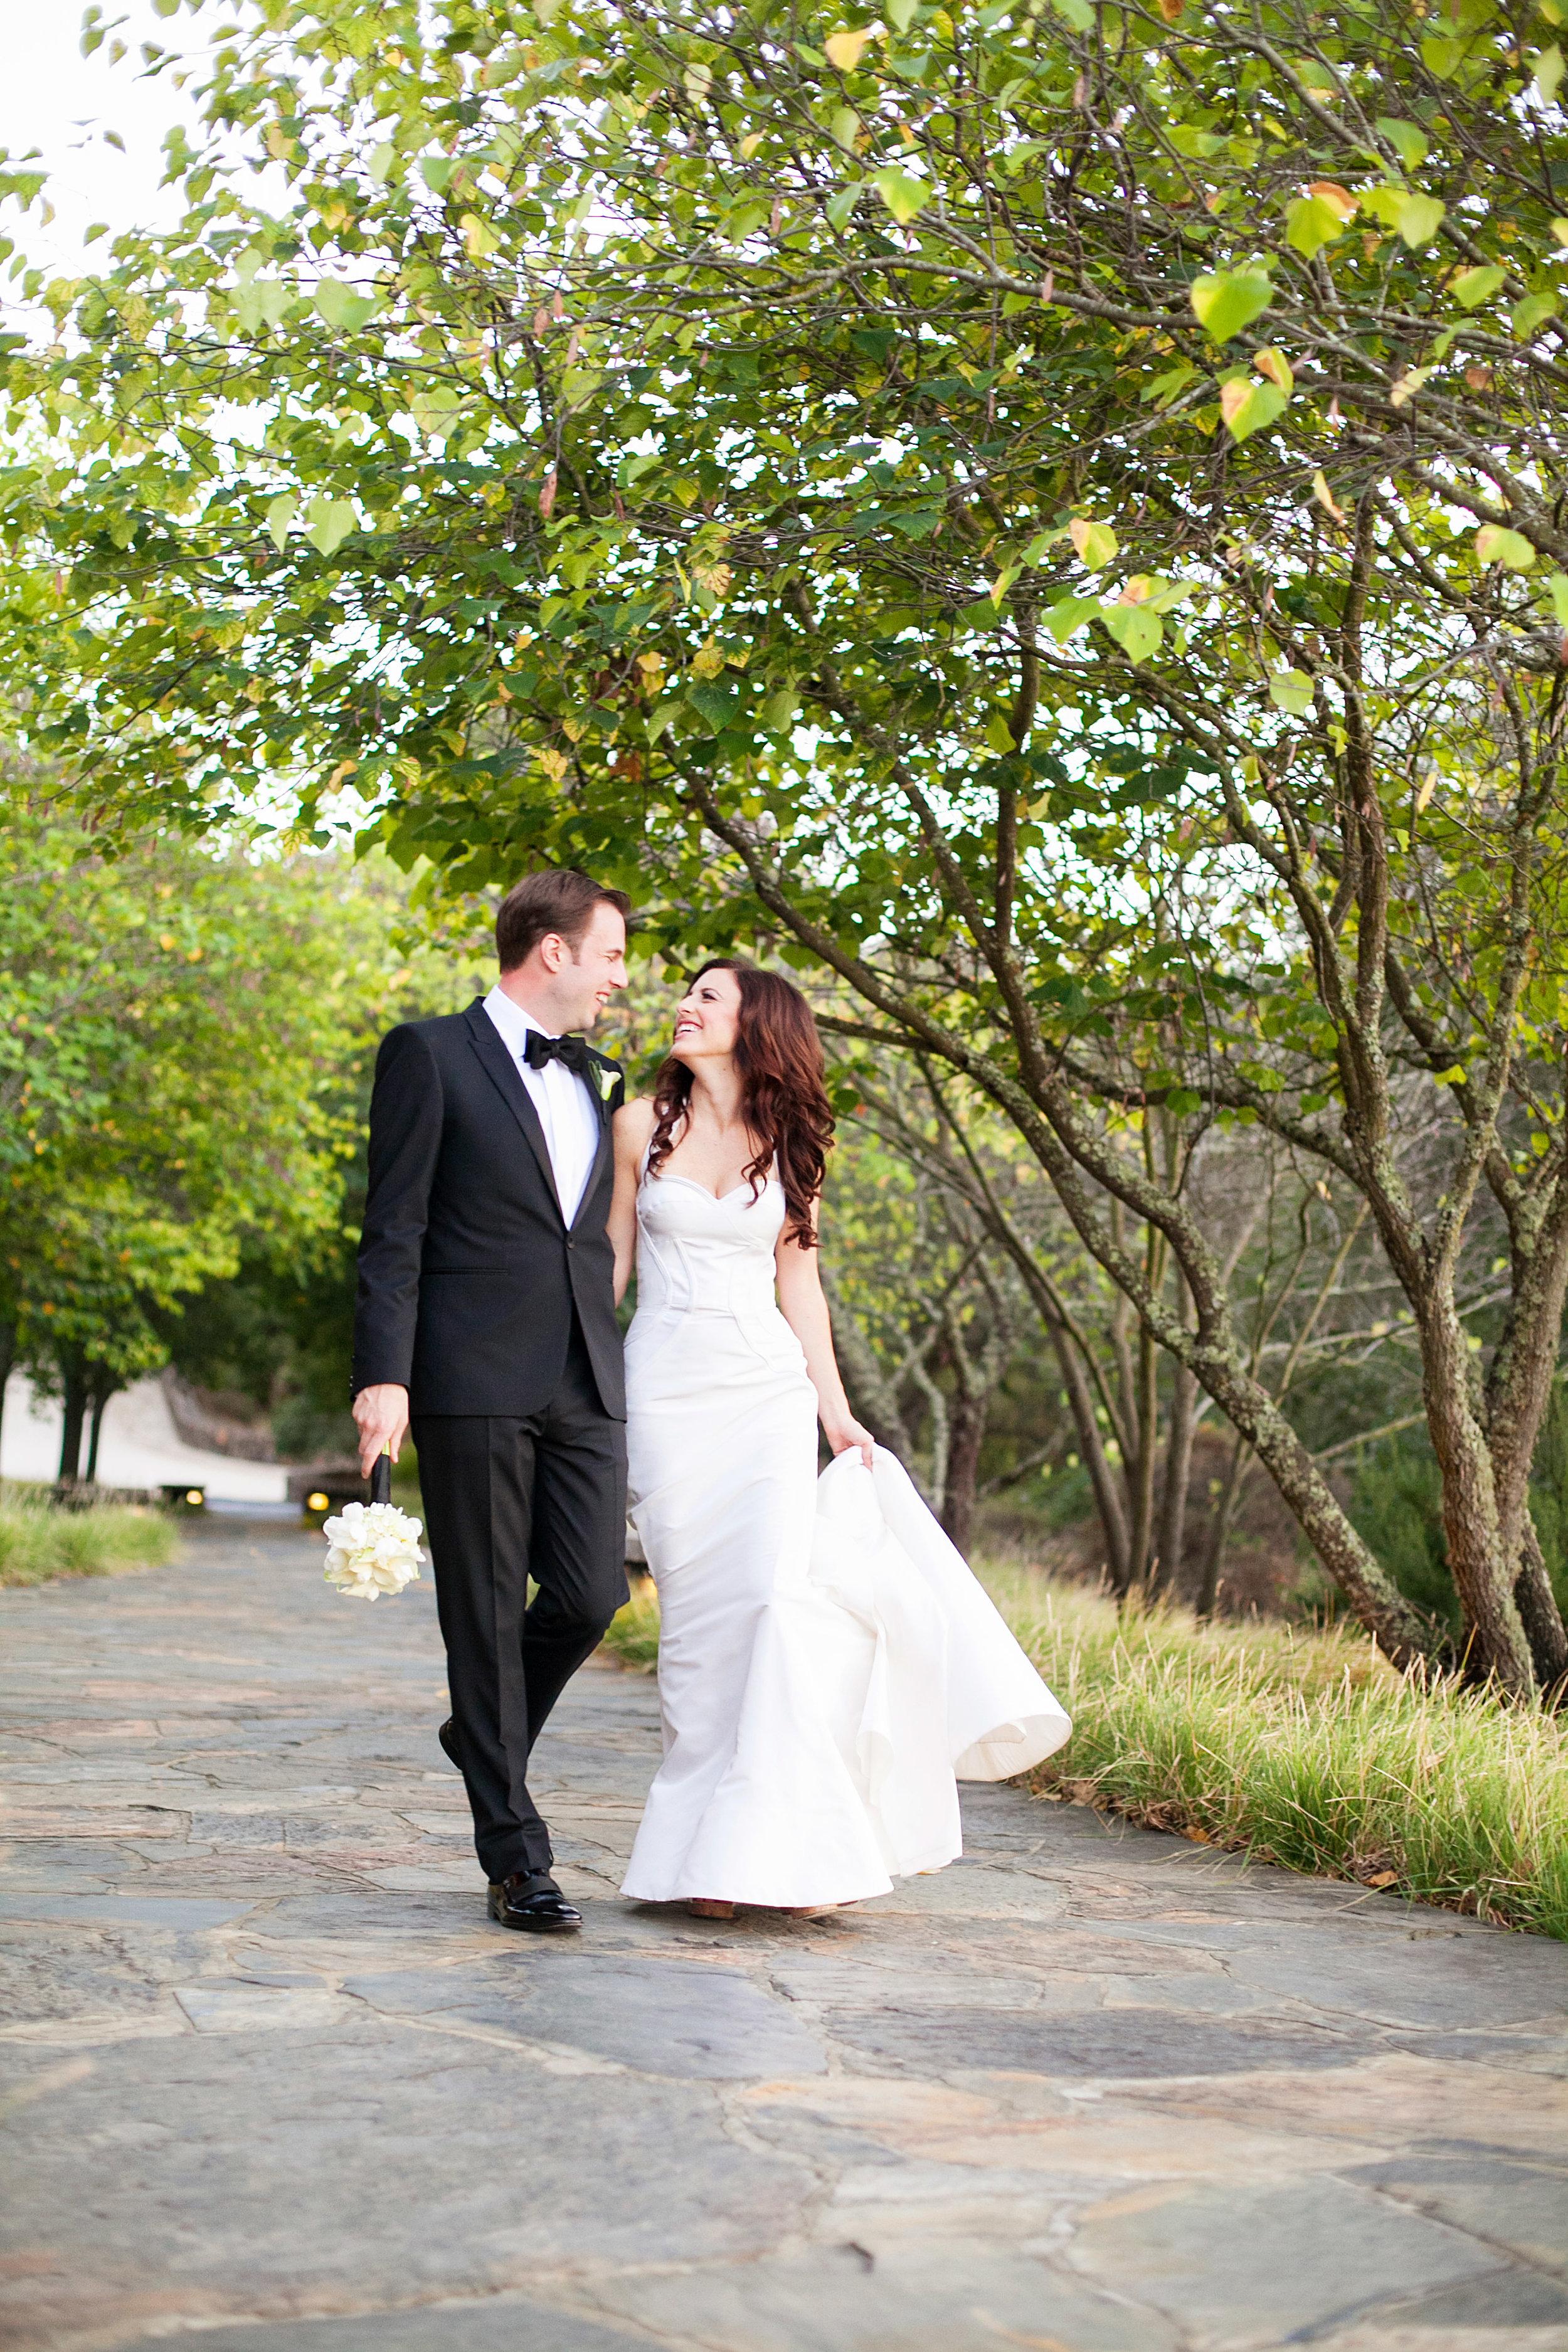 Best-Napa-Valley-Wedding-Venues-Chalk-Hill-Healdsburg.jpg